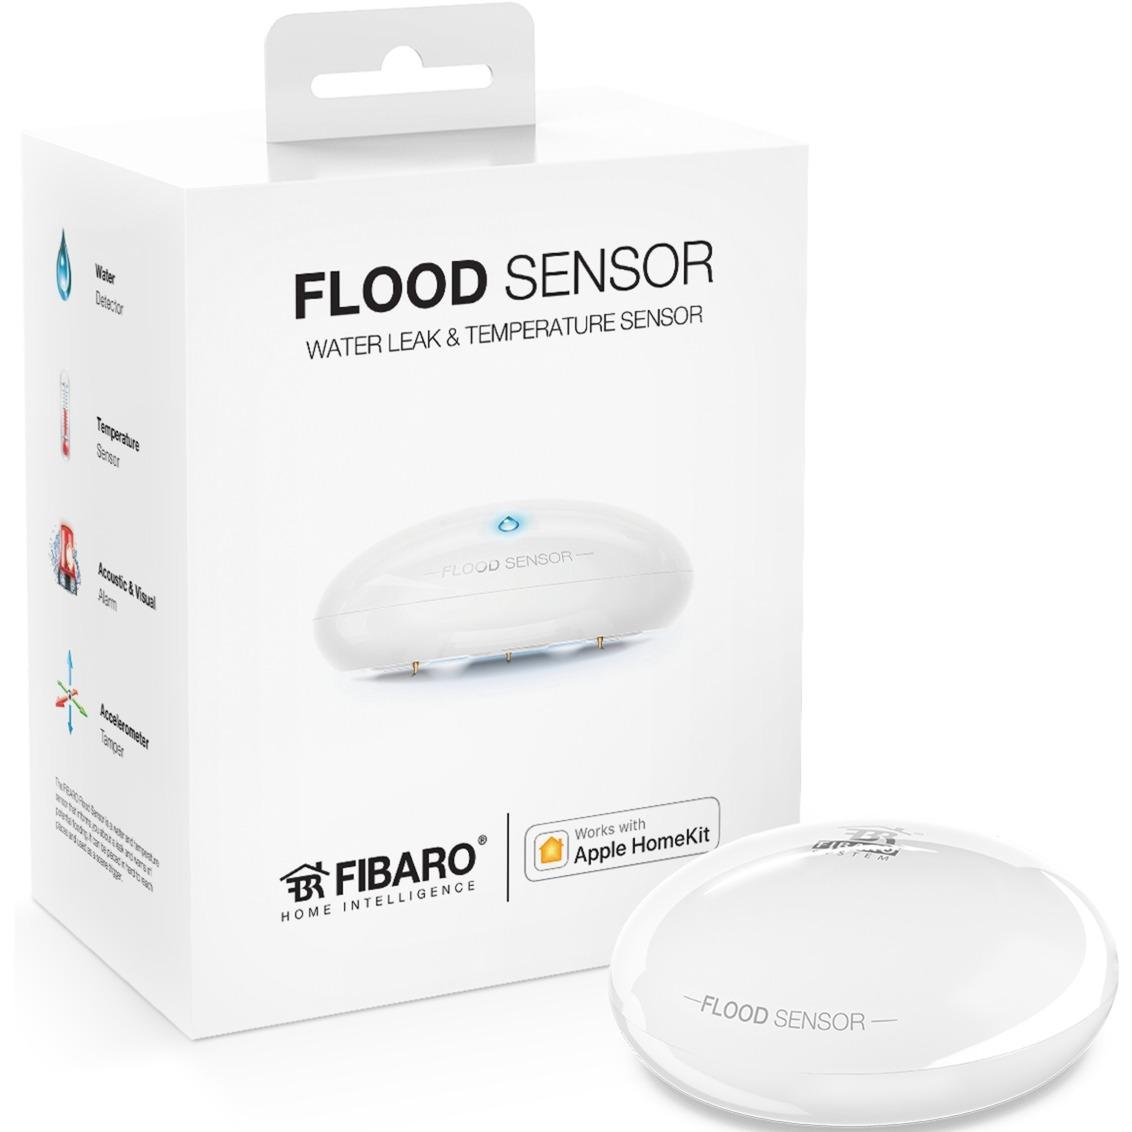 FGBHFS-101 Bluetooth mulltisensor smart home